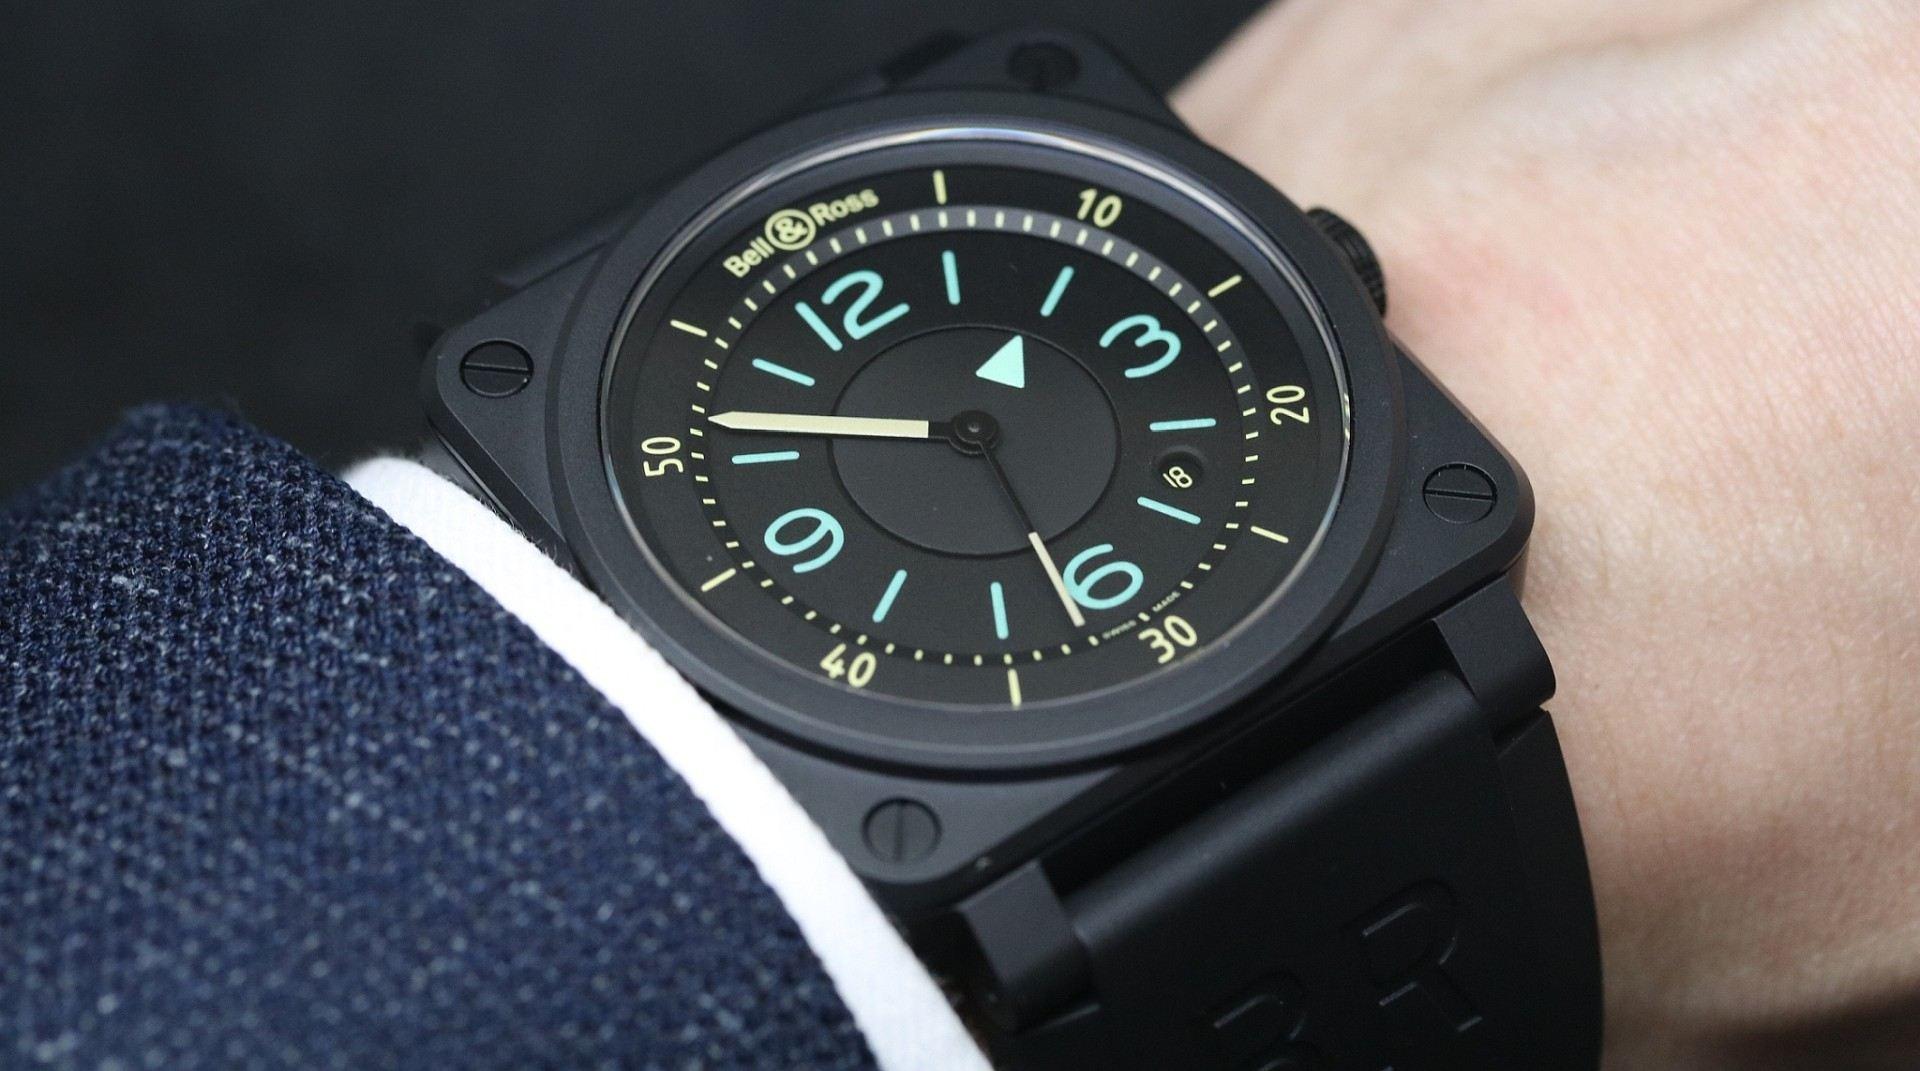 【2019 BASEL錶展報導】五分鐘秒懂BELL & ROSS 2019巴塞爾新品(有建議售價)